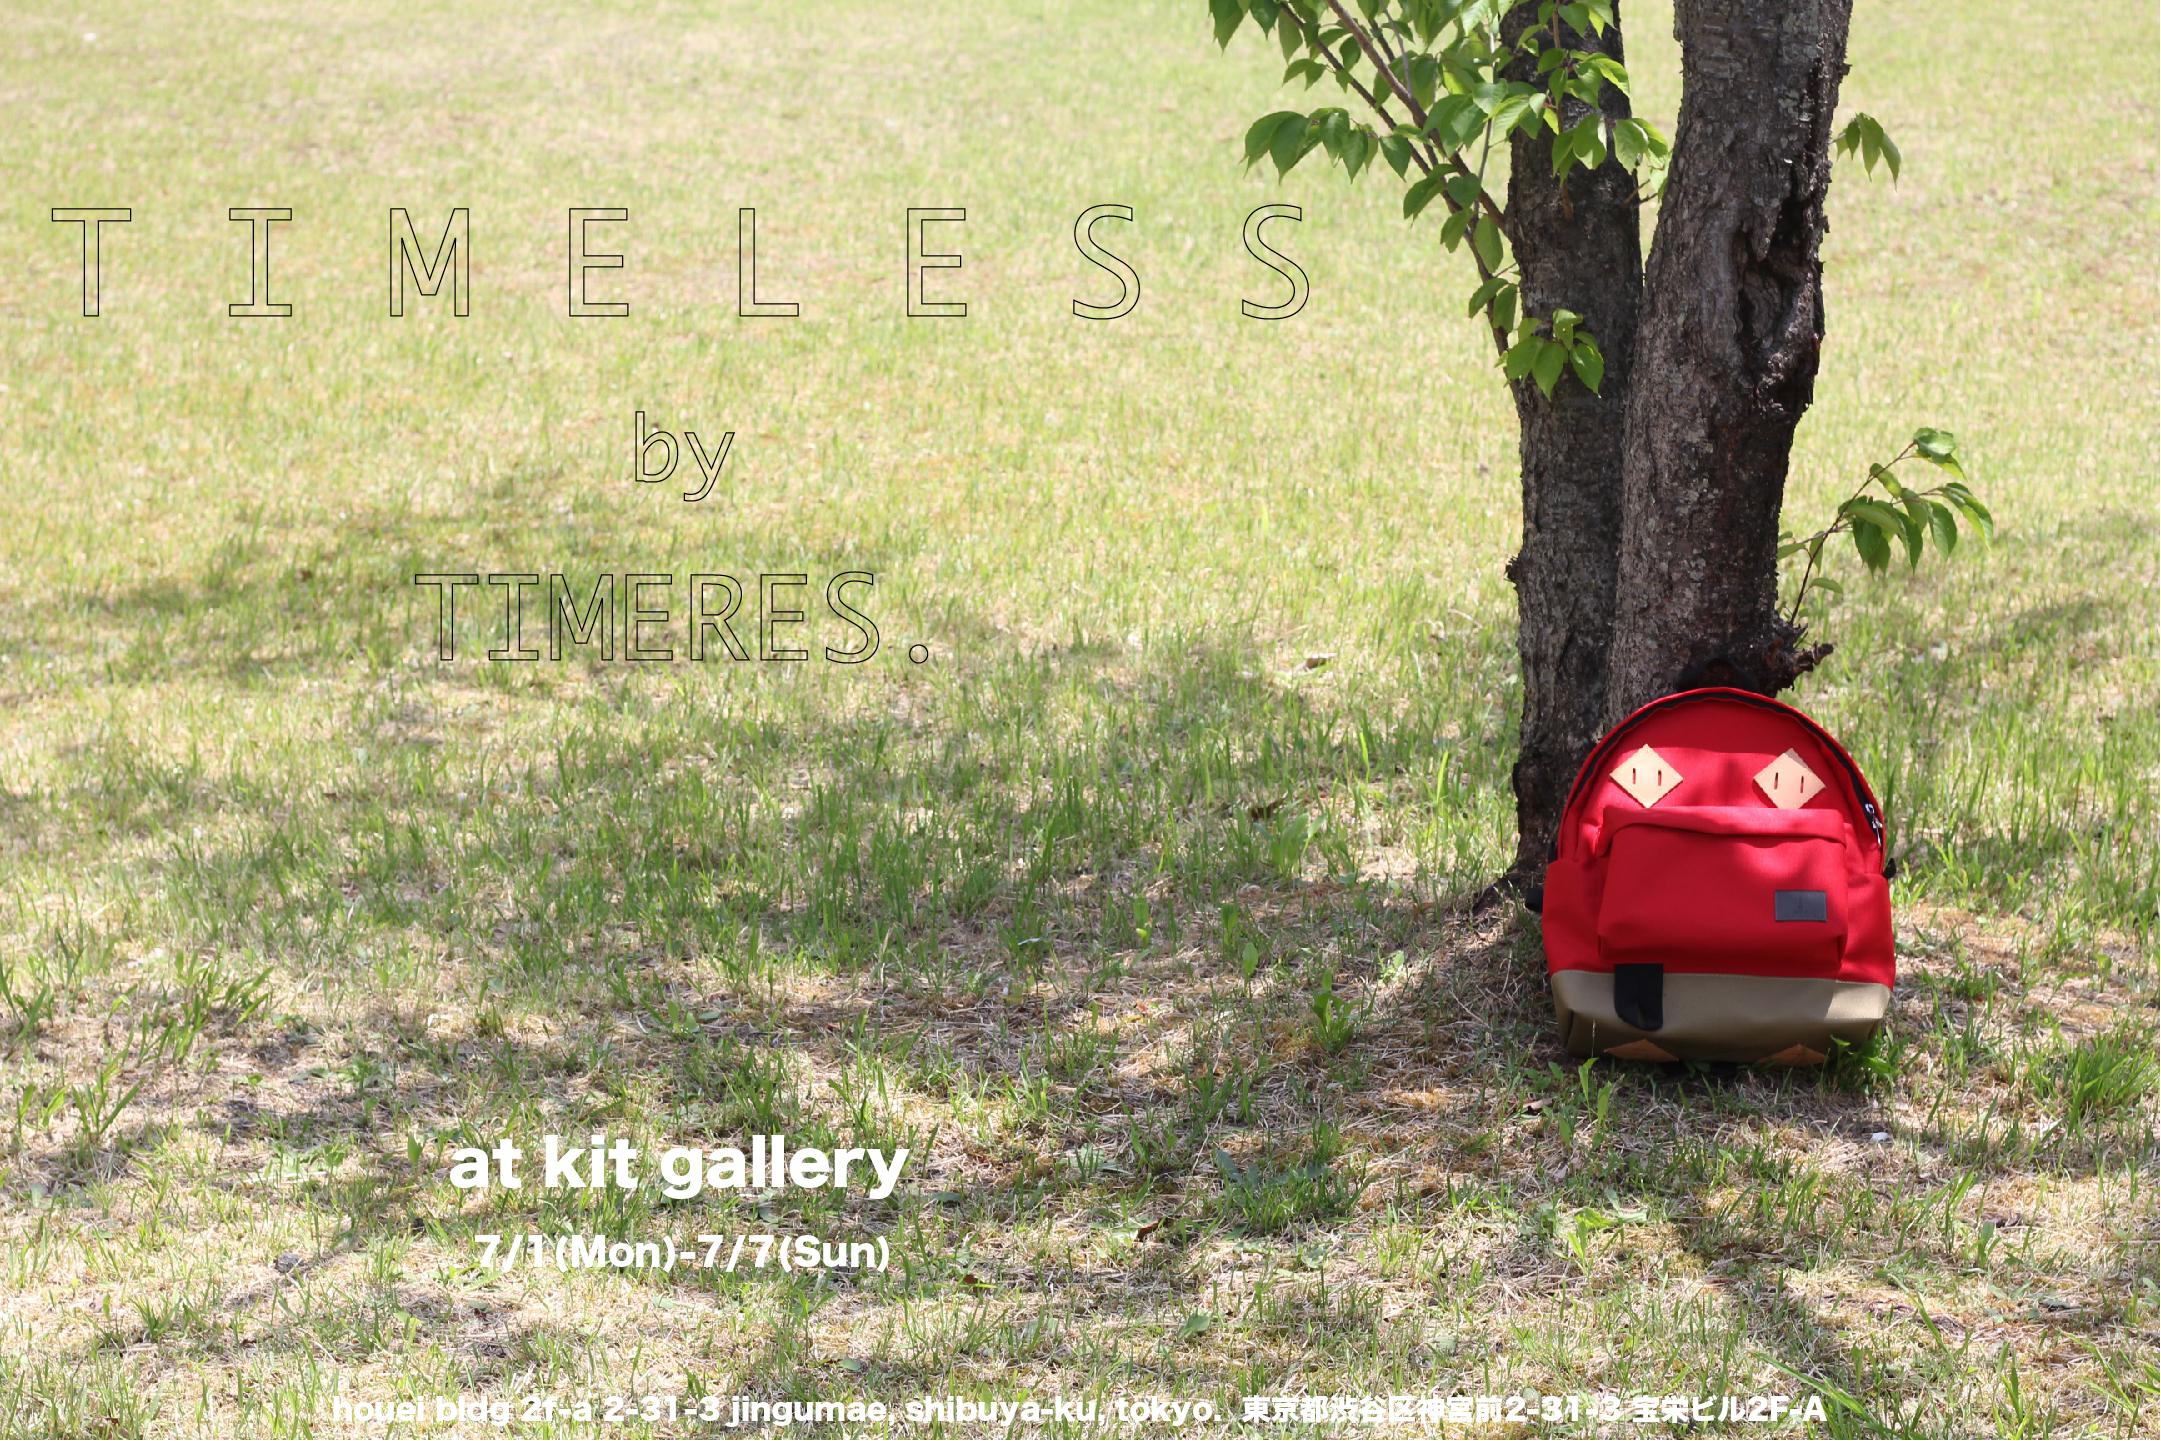 http://kit-gallery.com/schedule/files/TIMELESS2.jpg